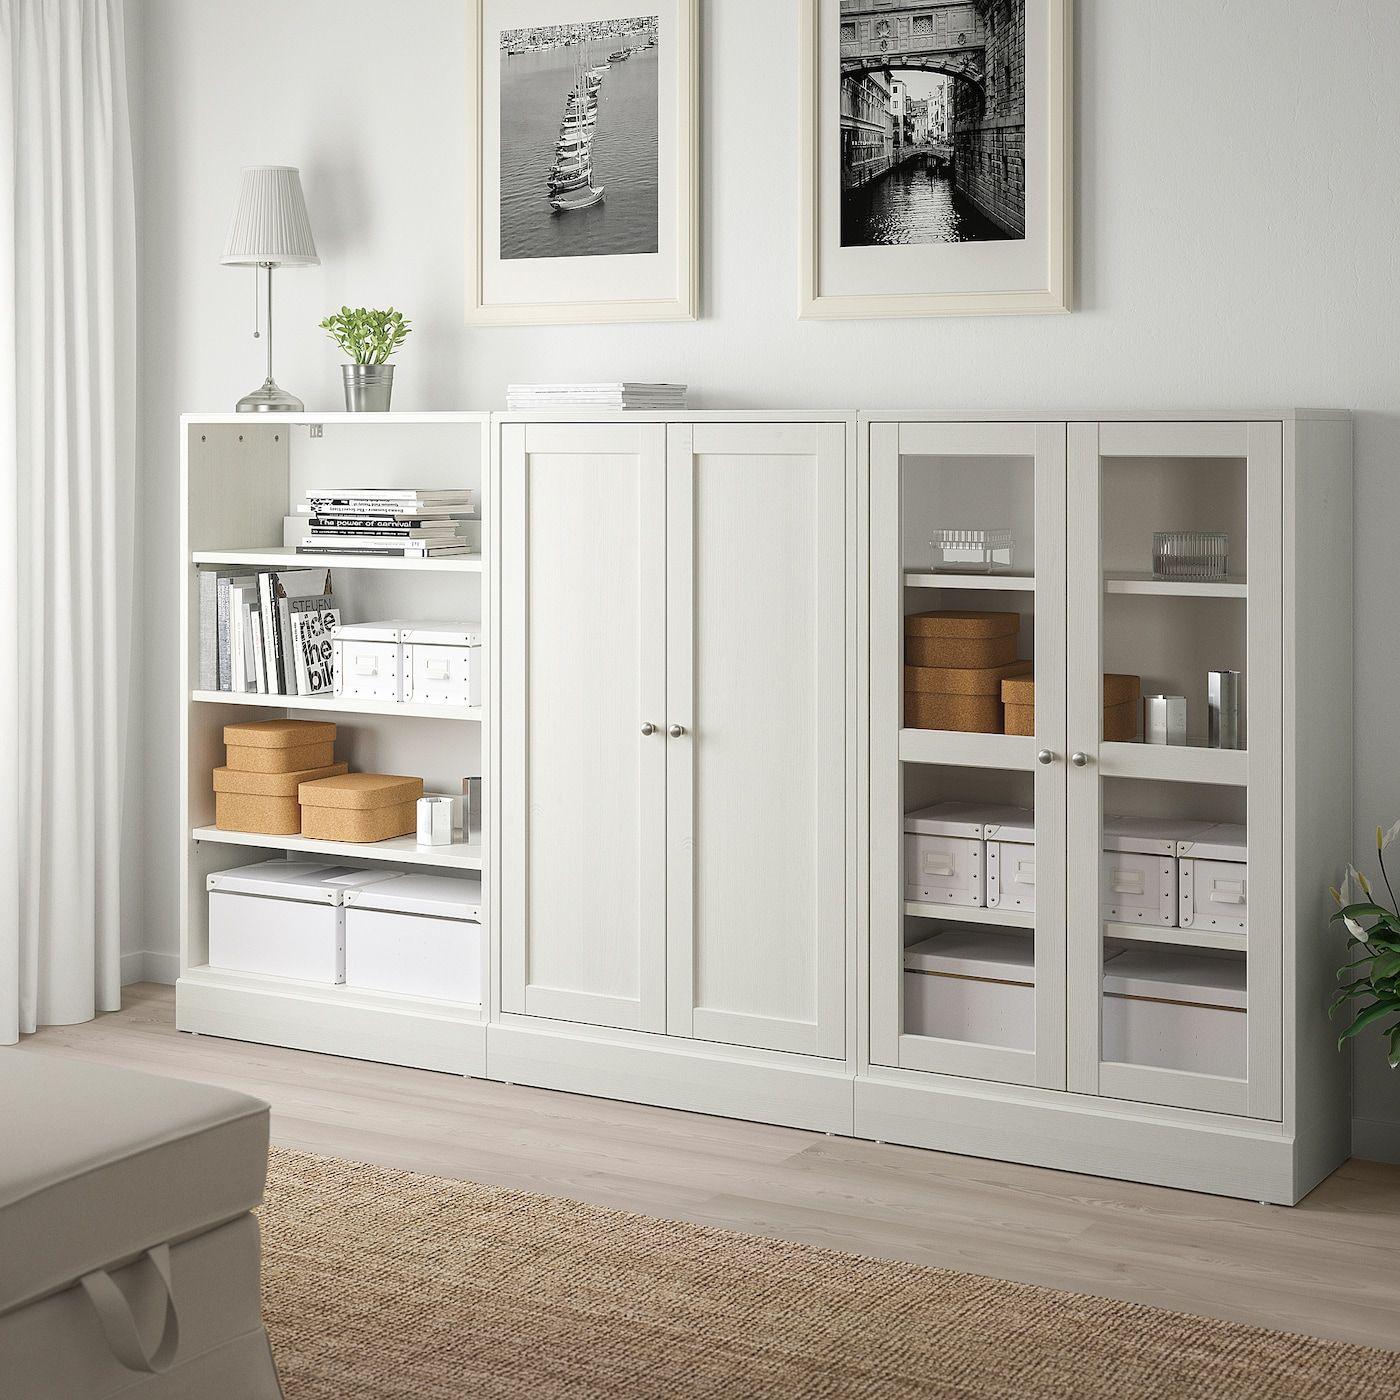 Best Ikea Havsta Storage Combination W Glass Doors White In 400 x 300